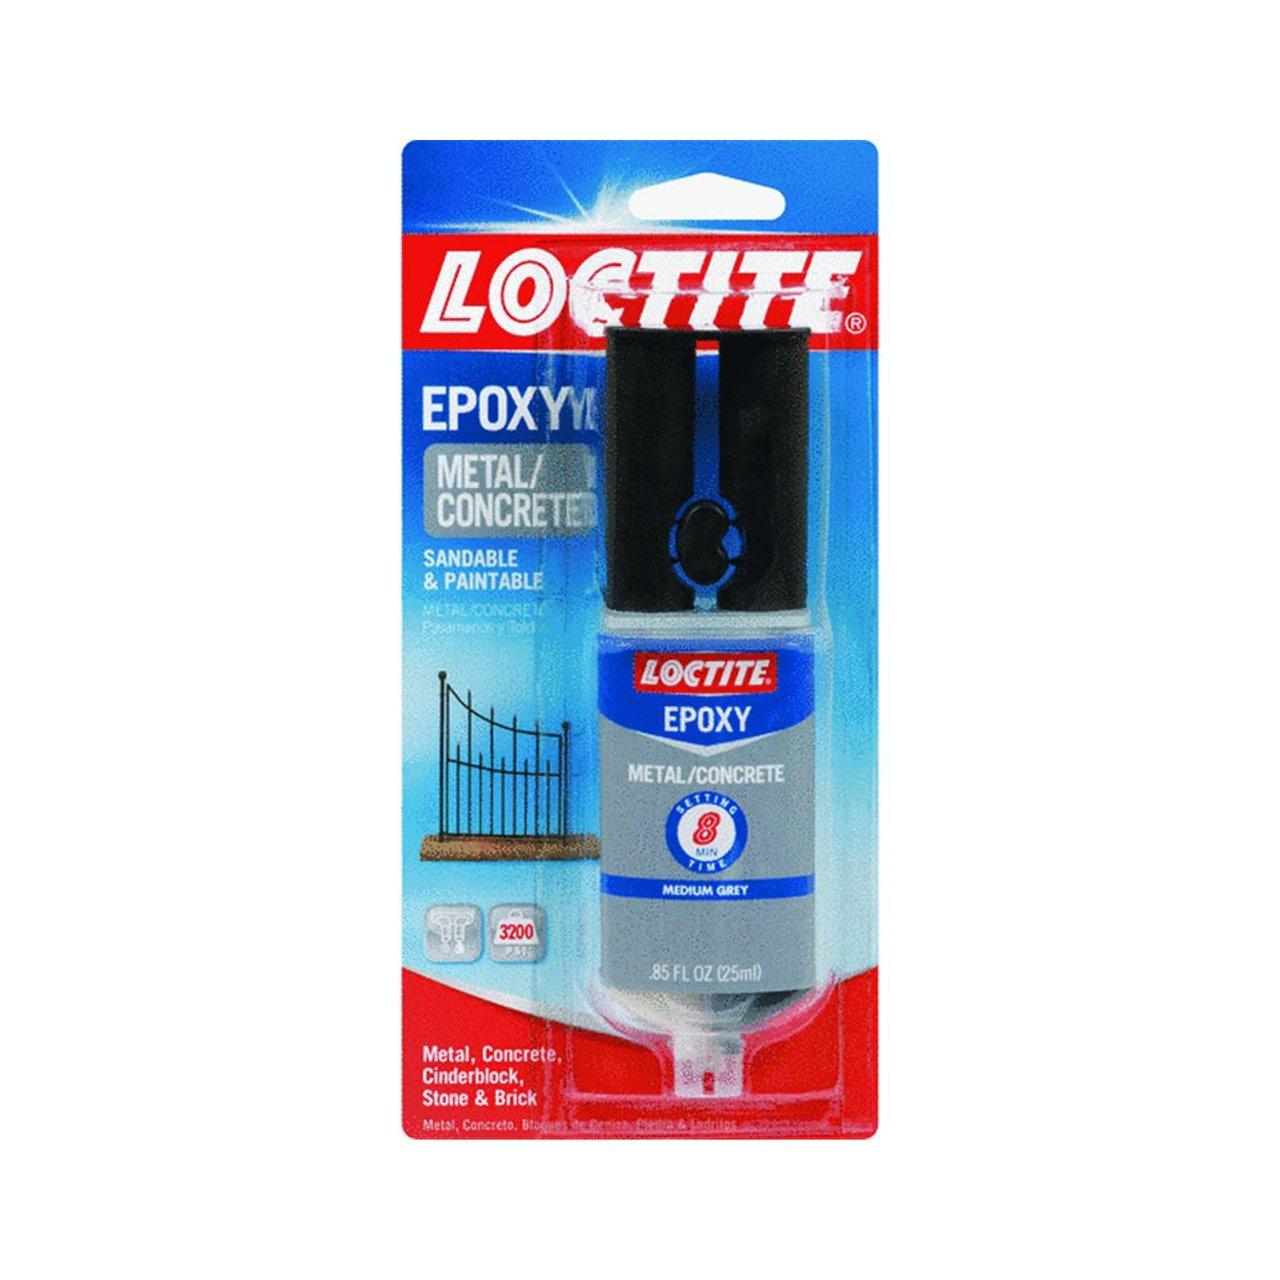 Wholesale Henkel 1405605 Steel Heavy Duty Epoxy, 0.85 oz Tube